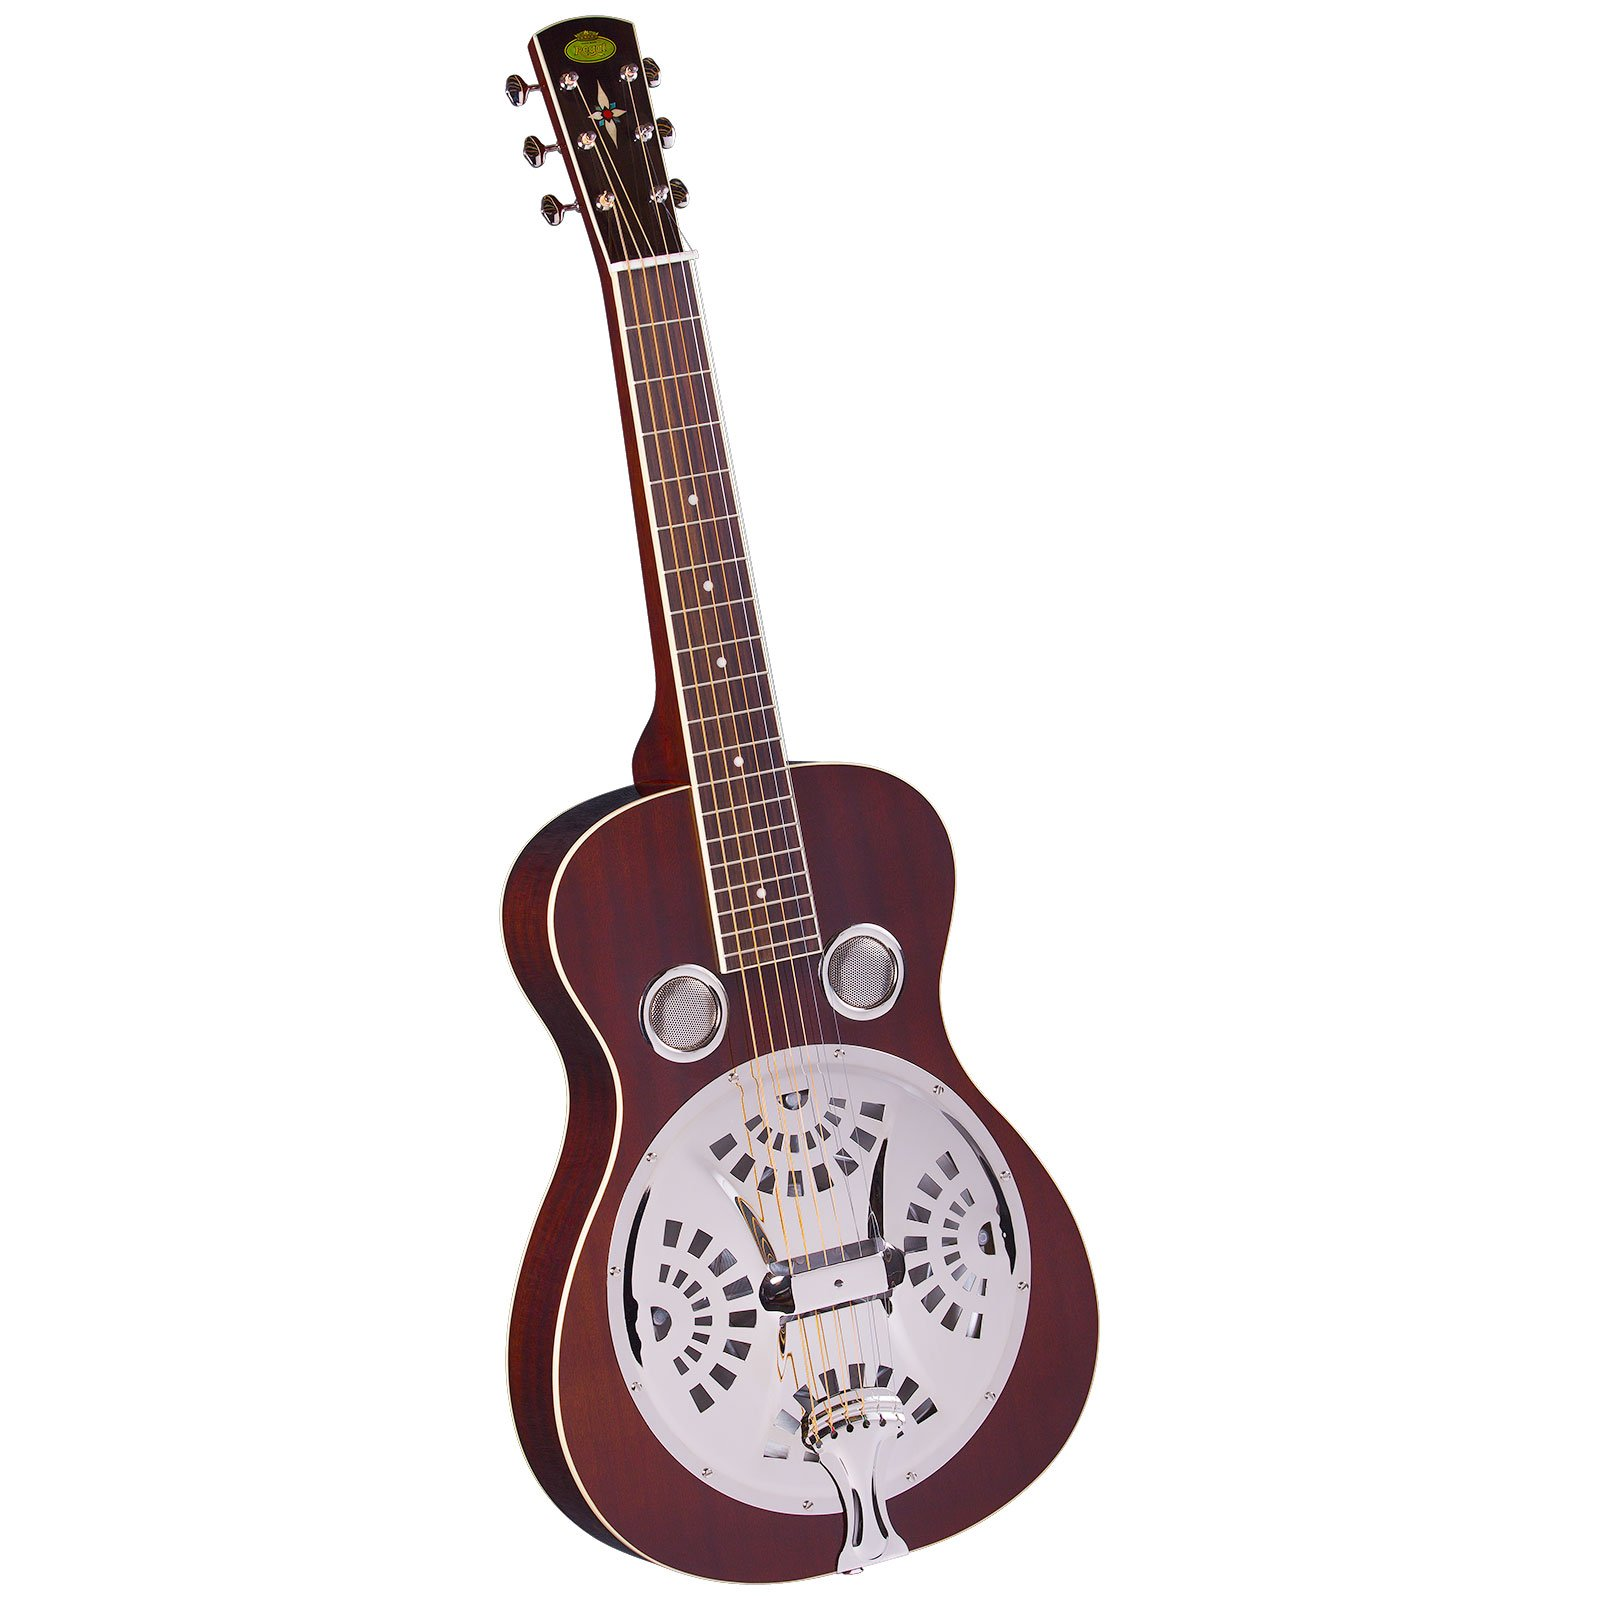 Regal RD-40MS Squareneck Resophonic Guitar - Natural Mahogany